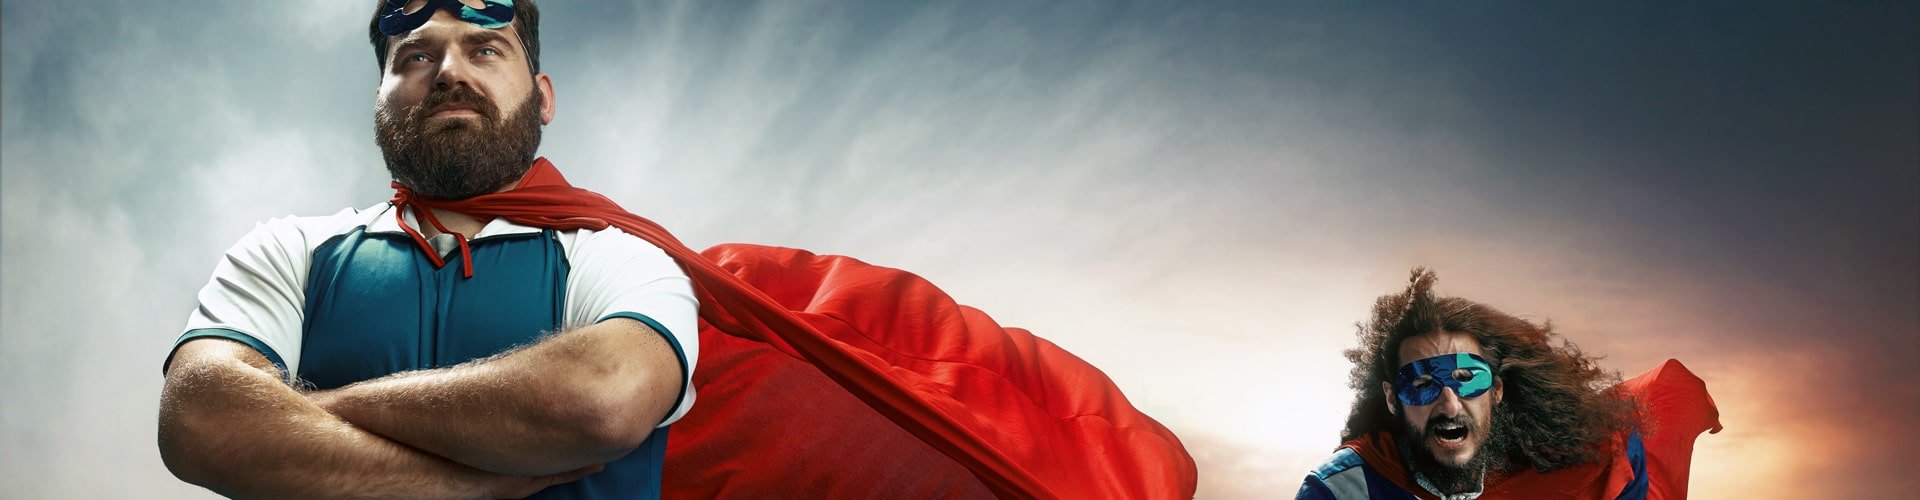 Starkes Gespann: Der Tandem-Spot Foto: Shutterstock